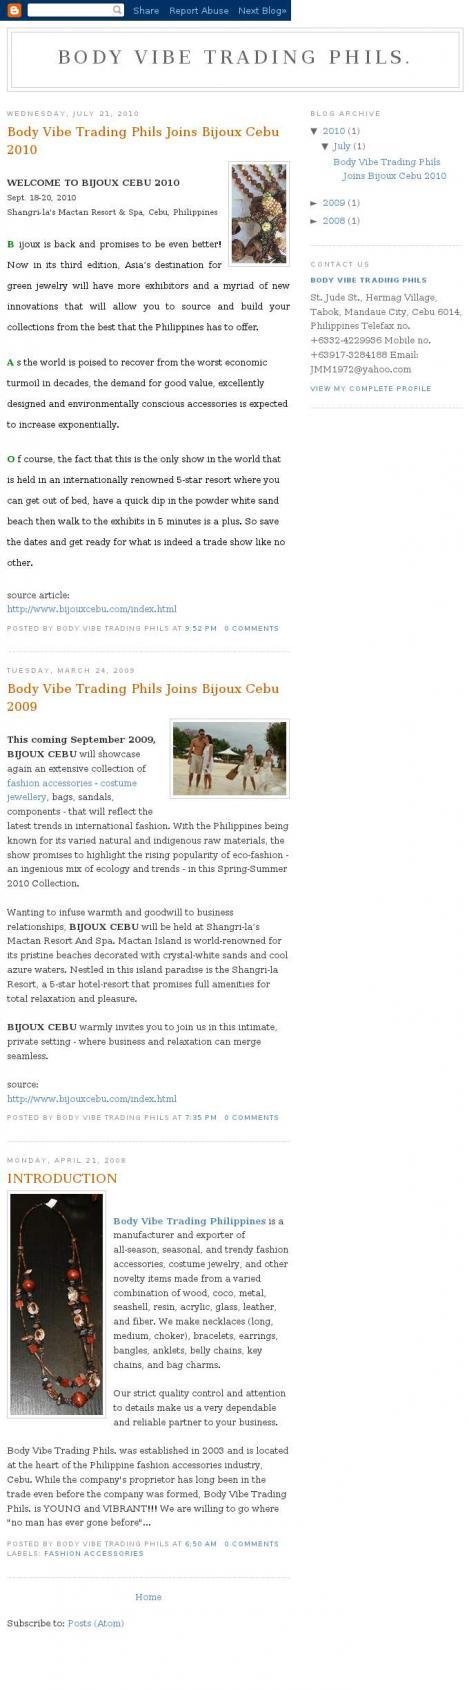 Body Vibe Trading Phils.